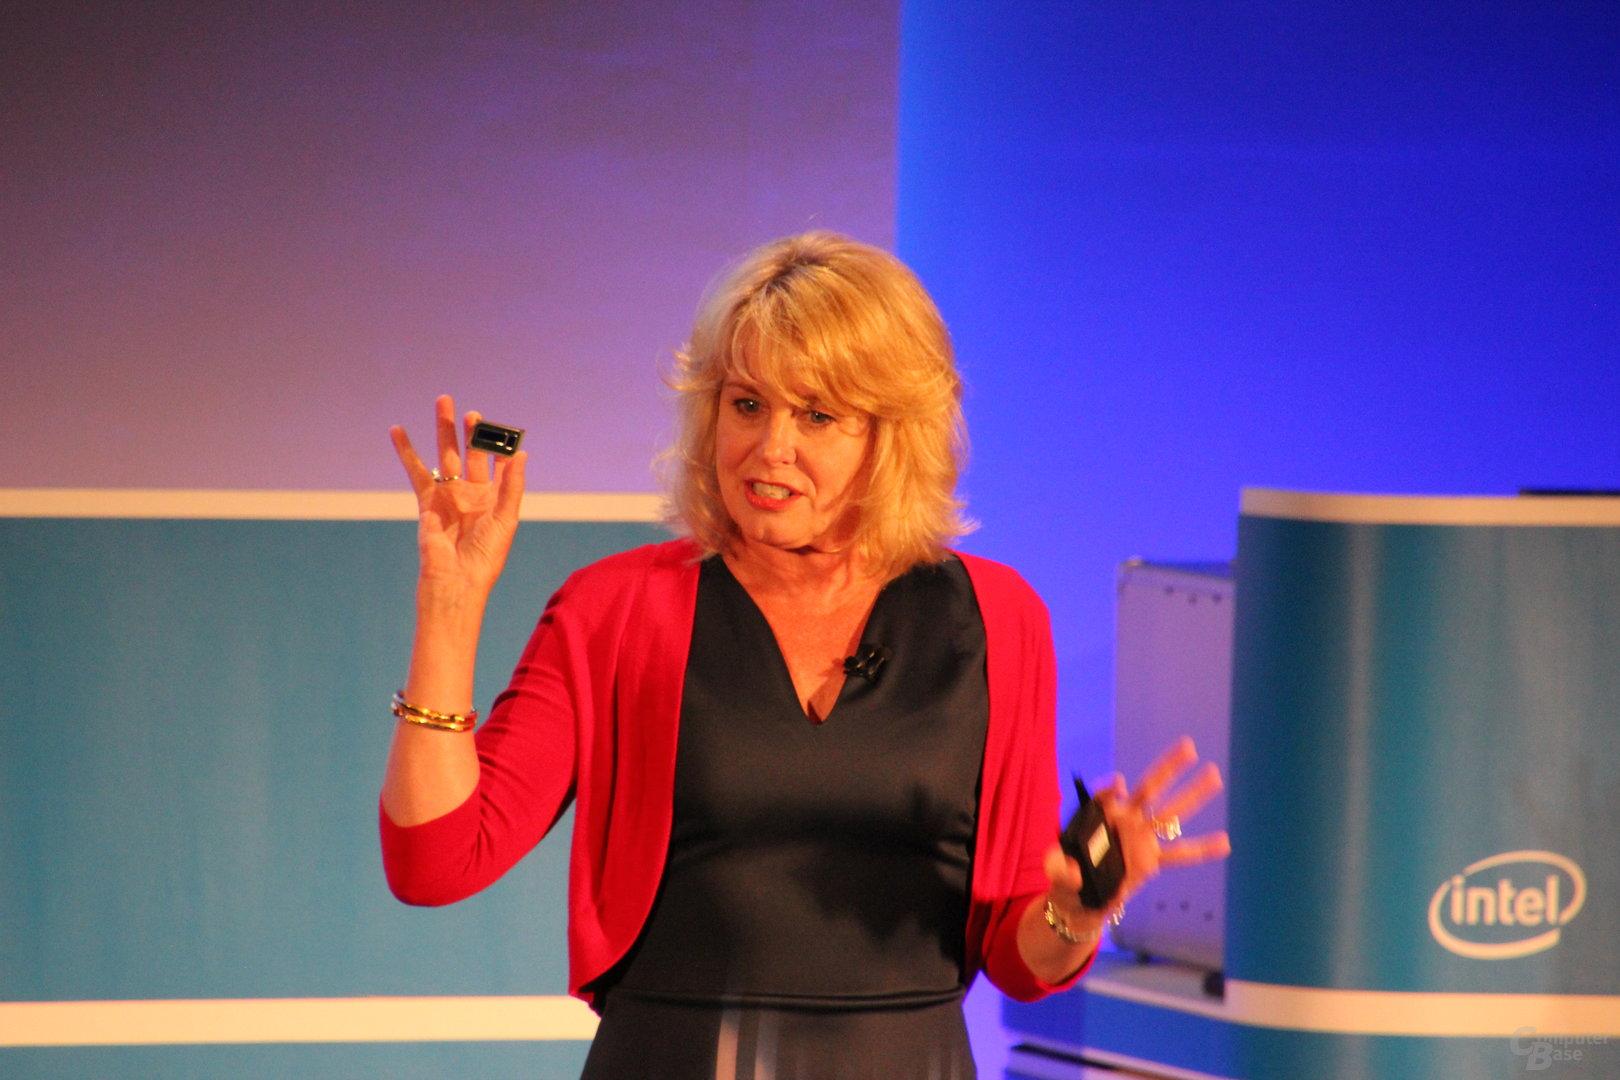 Diane Bryant zeigt Intel Xeon E3-1500 v5